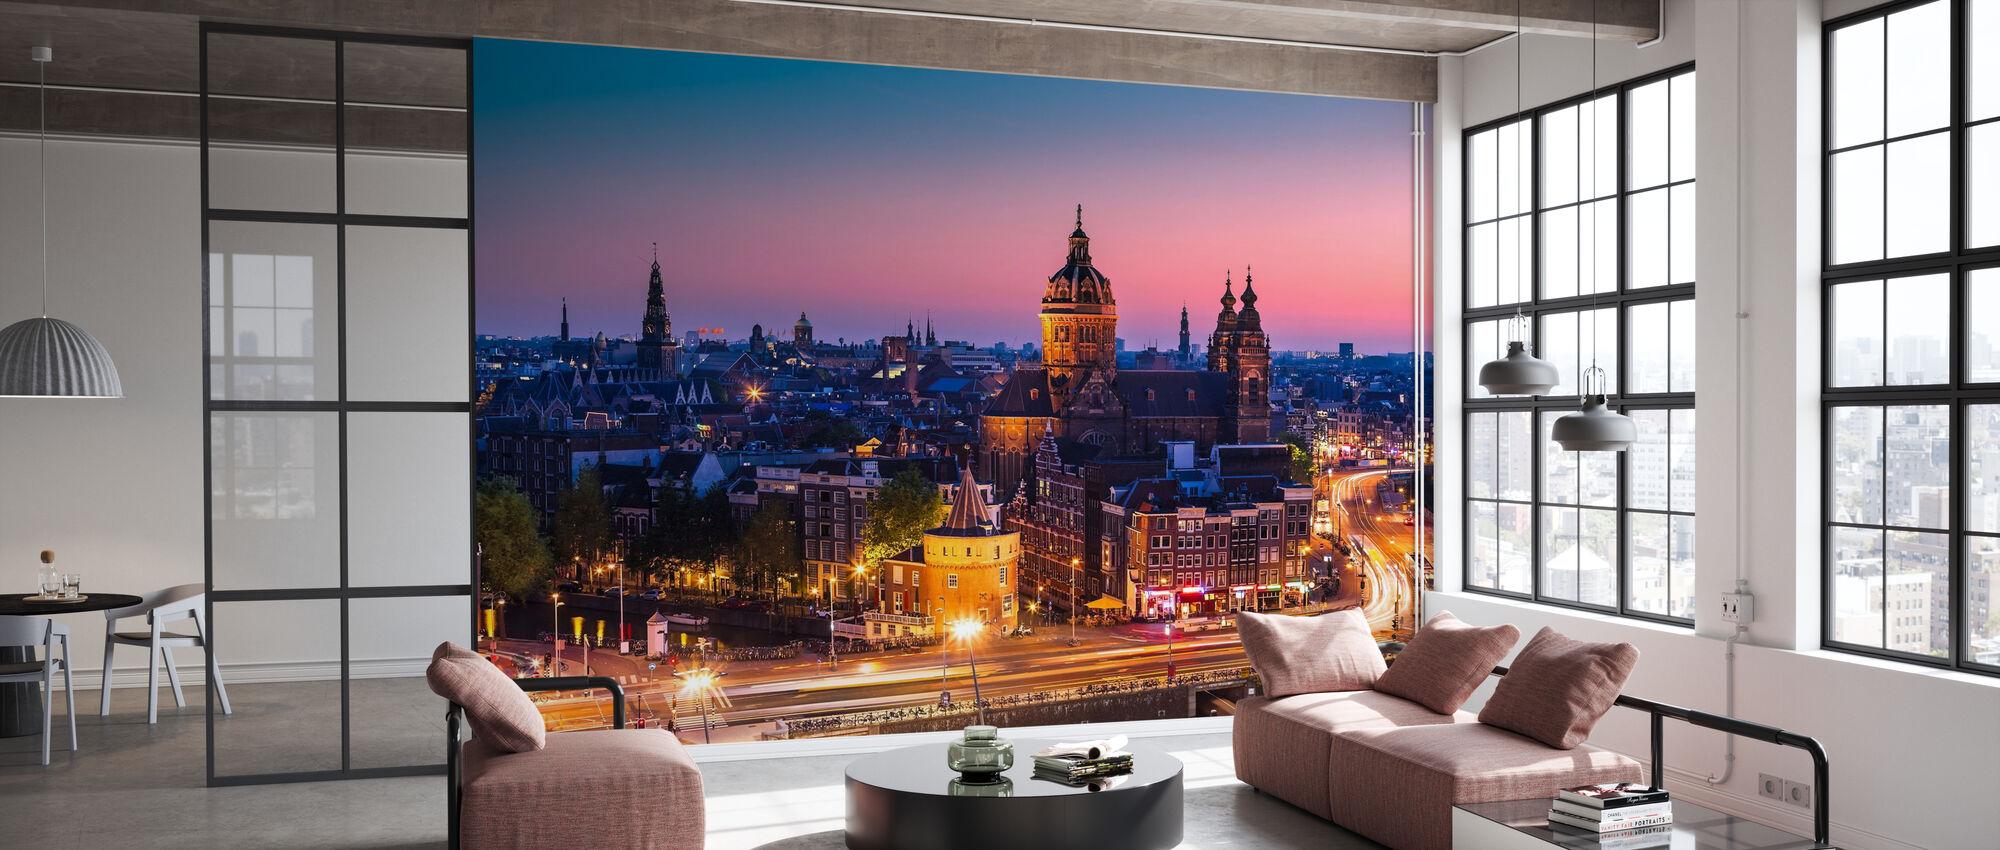 Amsterdam City - Wallpaper - Office